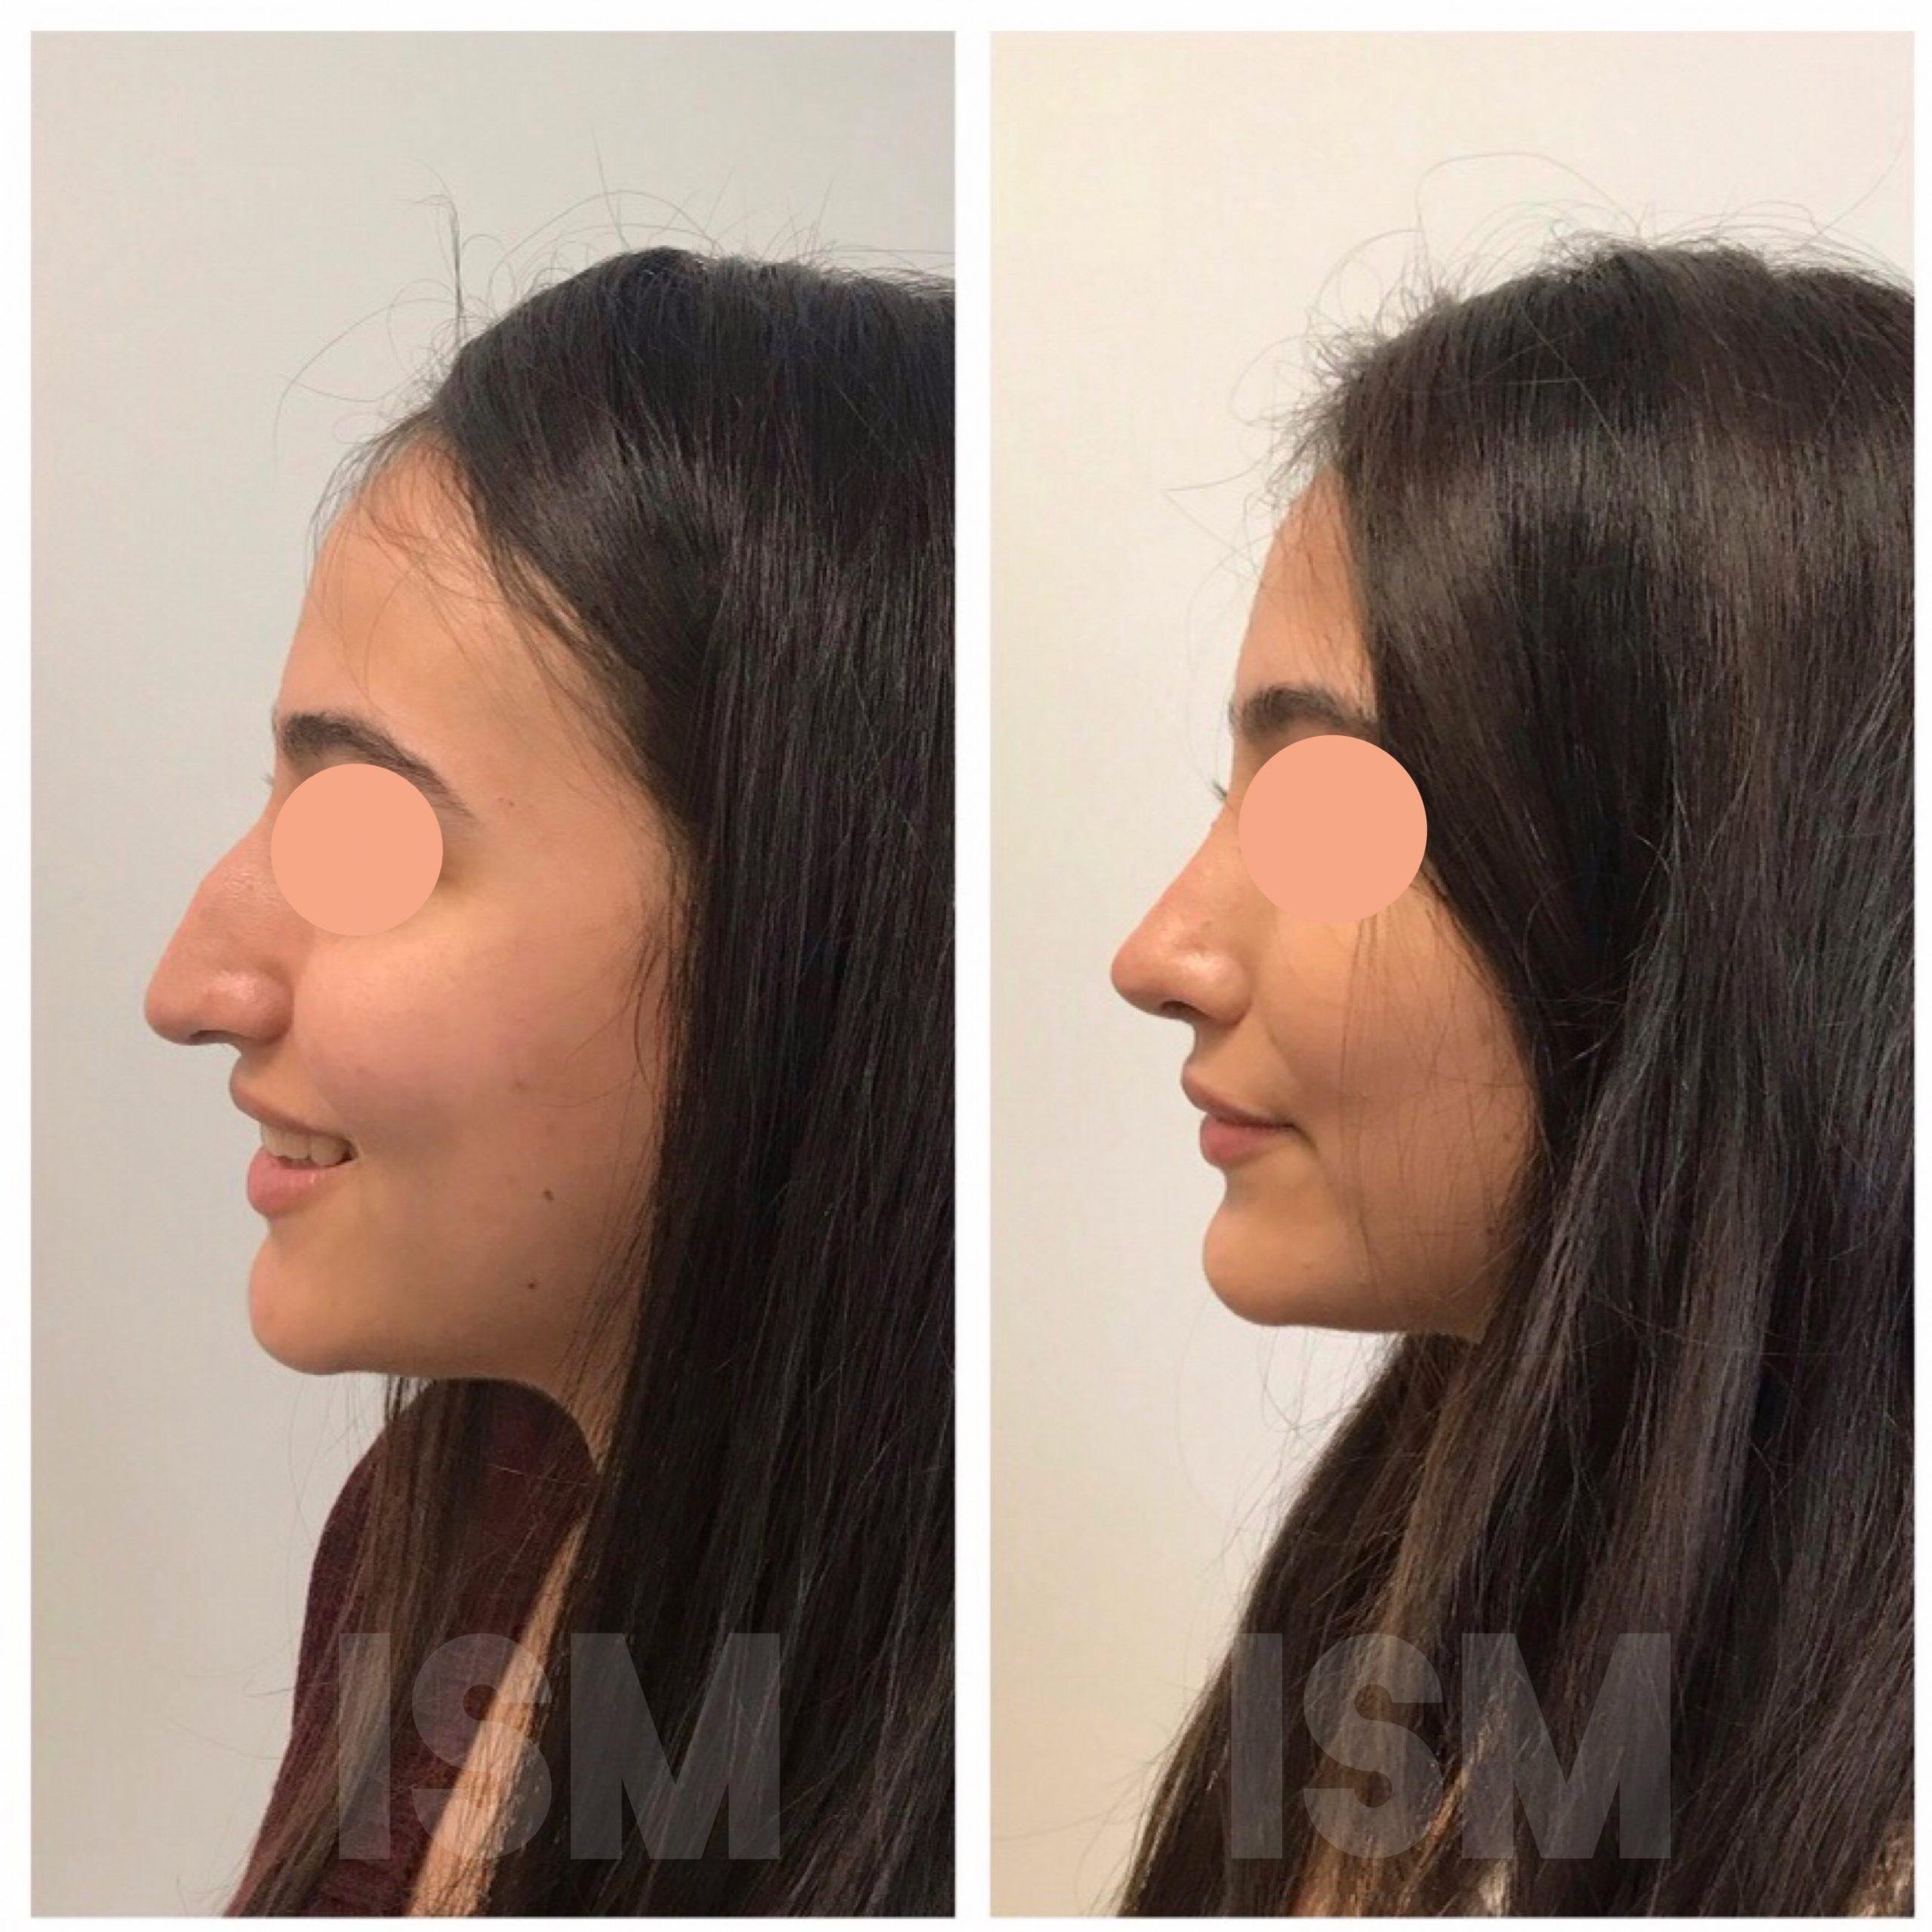 rhinoplasty-5